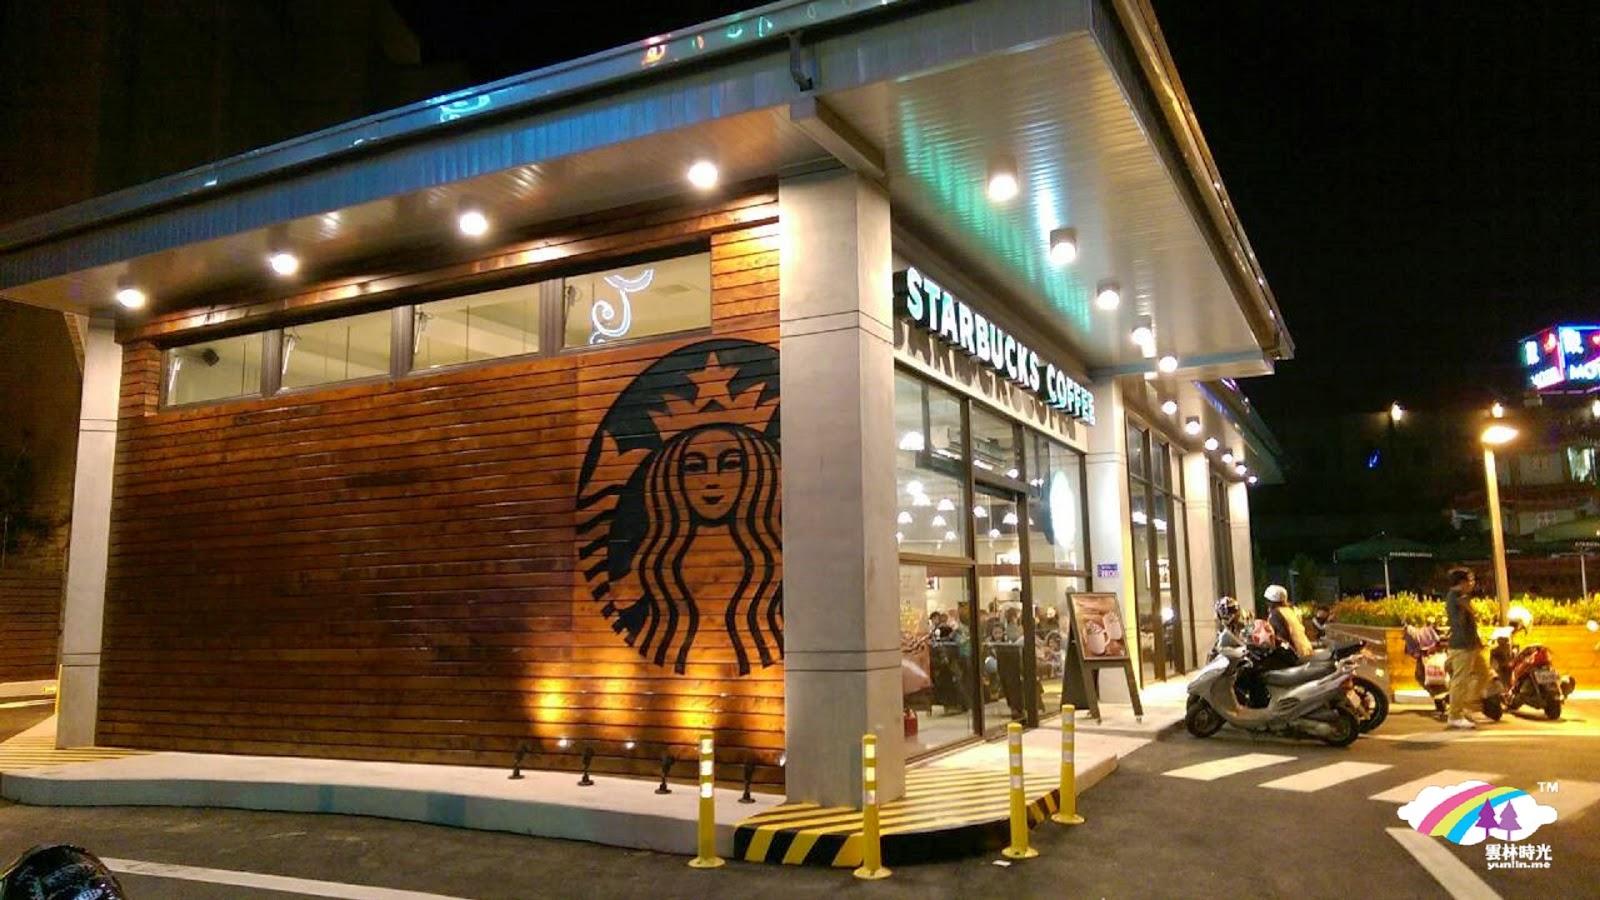 Starbuck Coffee星巴克斗六門市 於雲林路隆重開幕, 去朝聖一下~